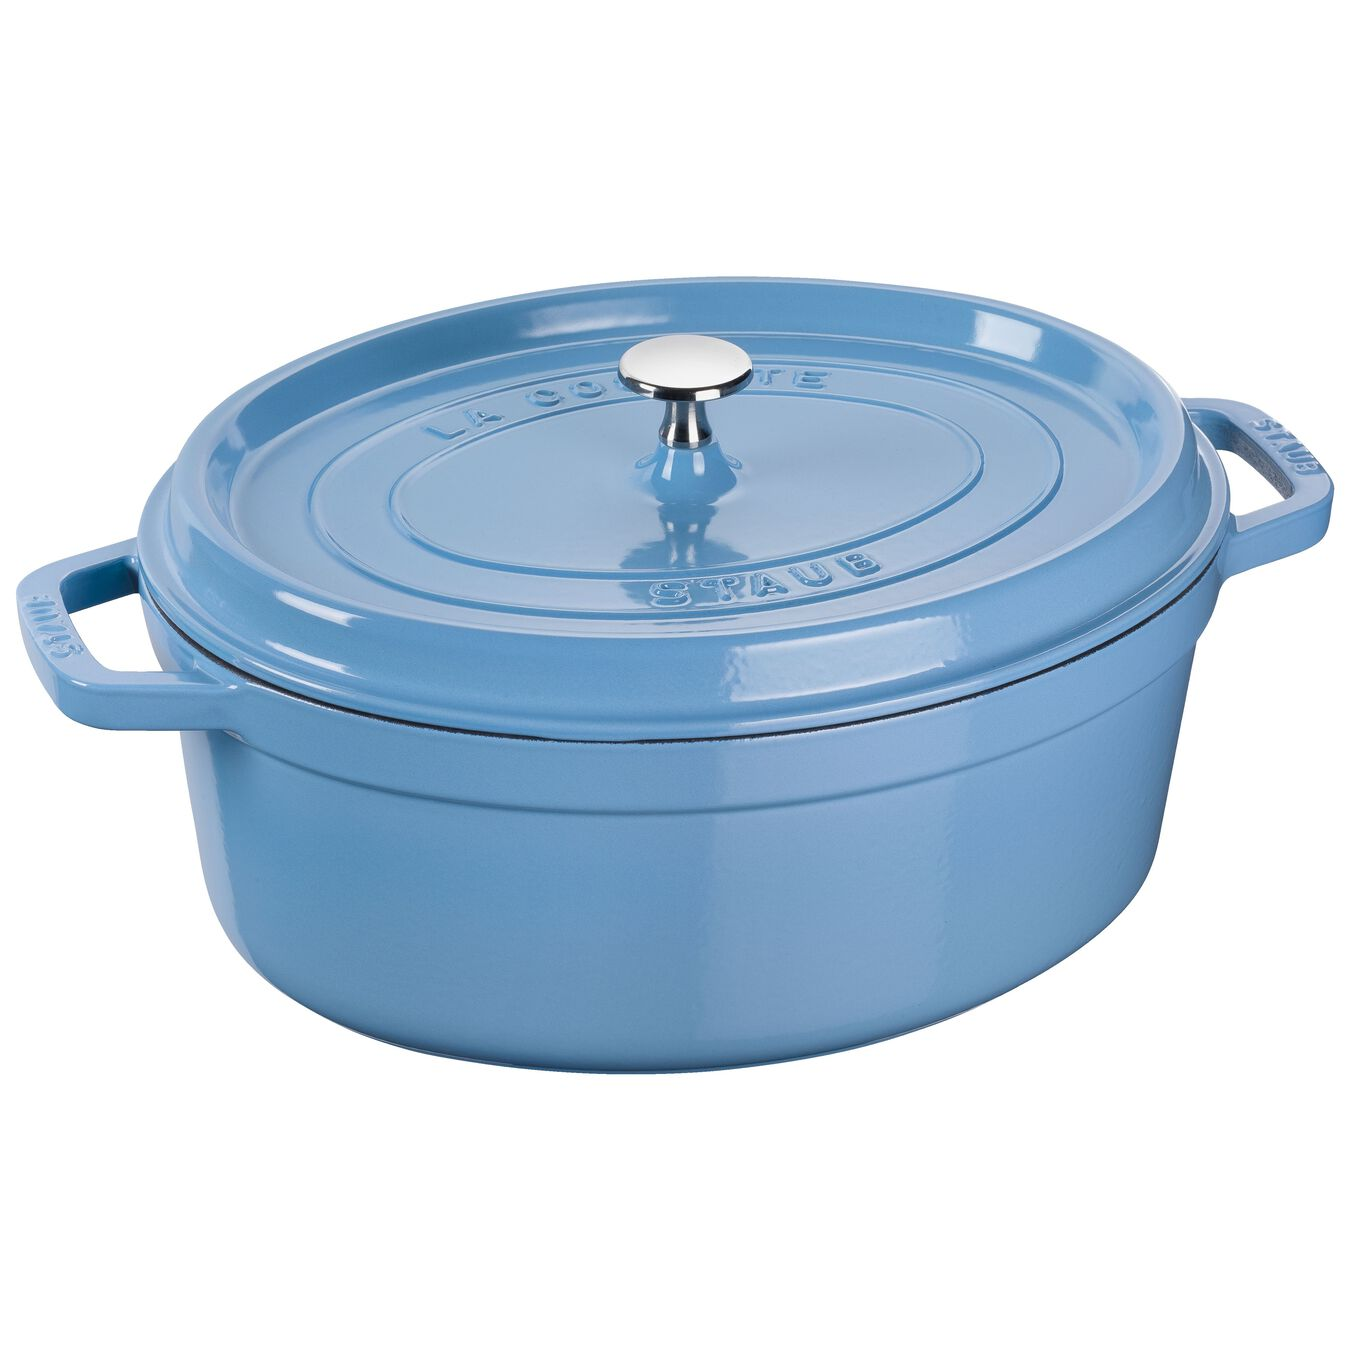 6 qt, oval, Cocotte, Ice-Blue,,large 1